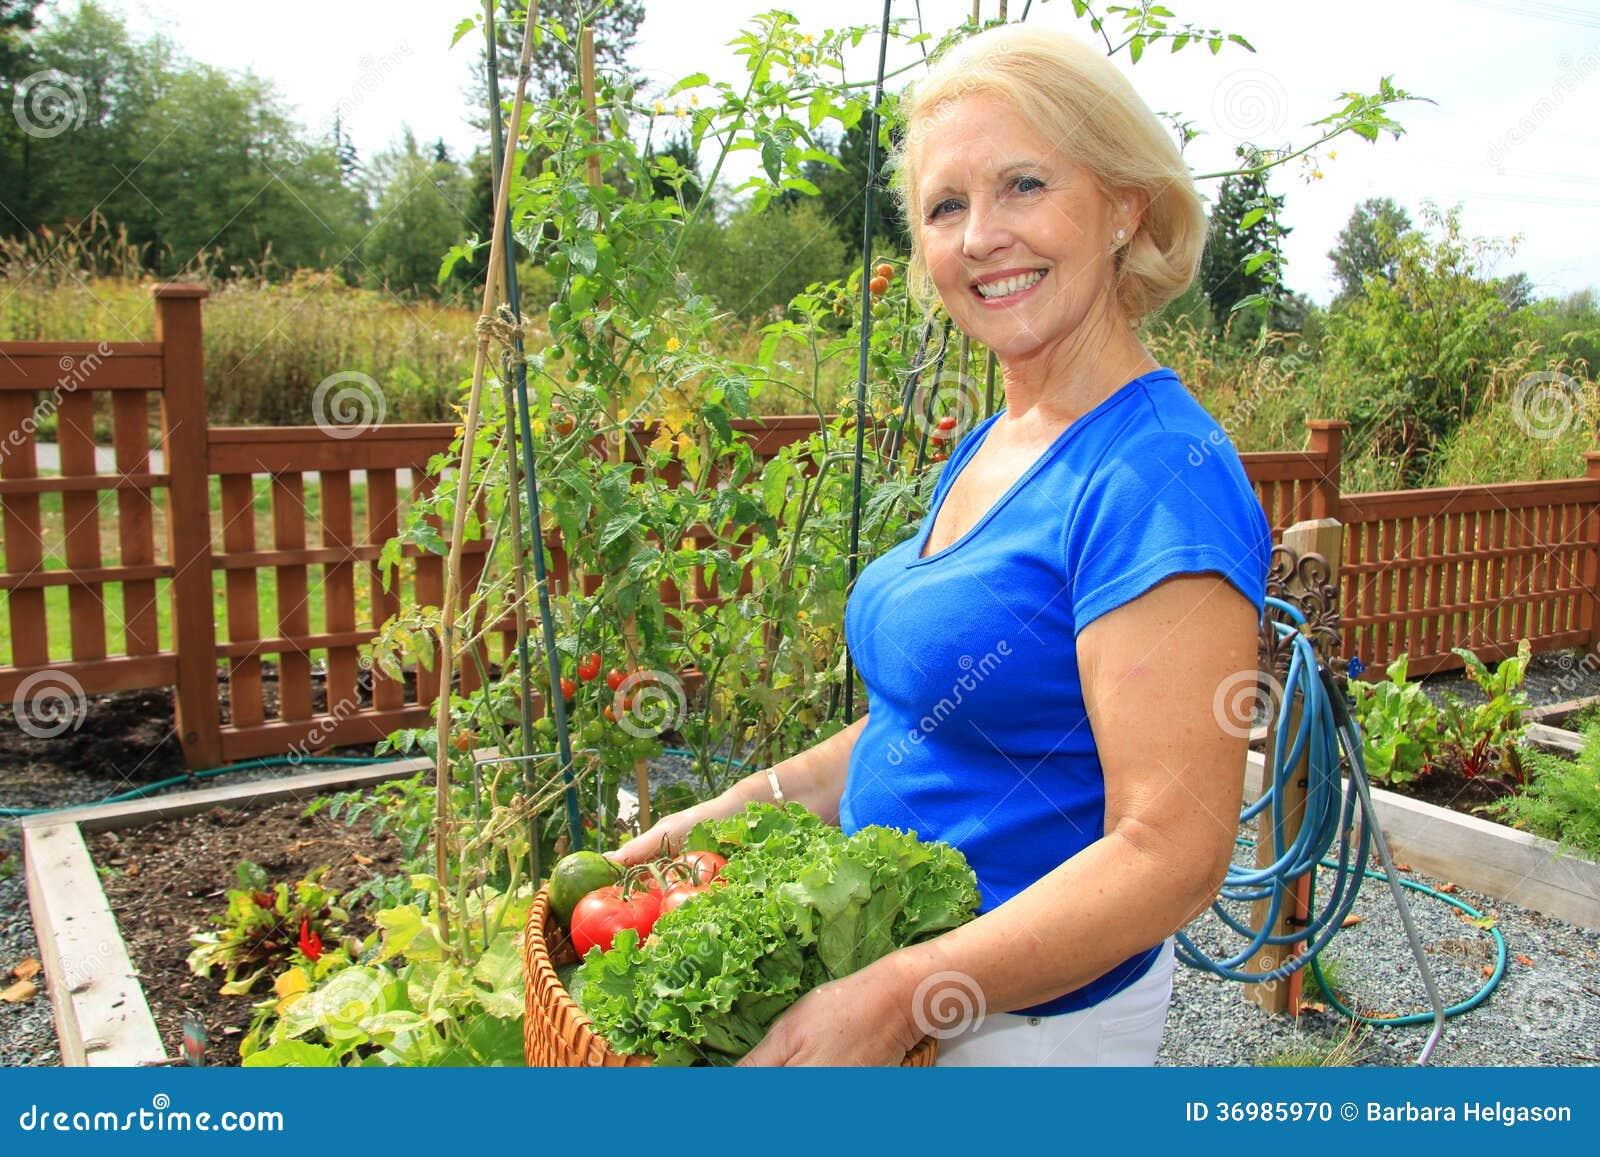 Giardiniere e verdure senior.